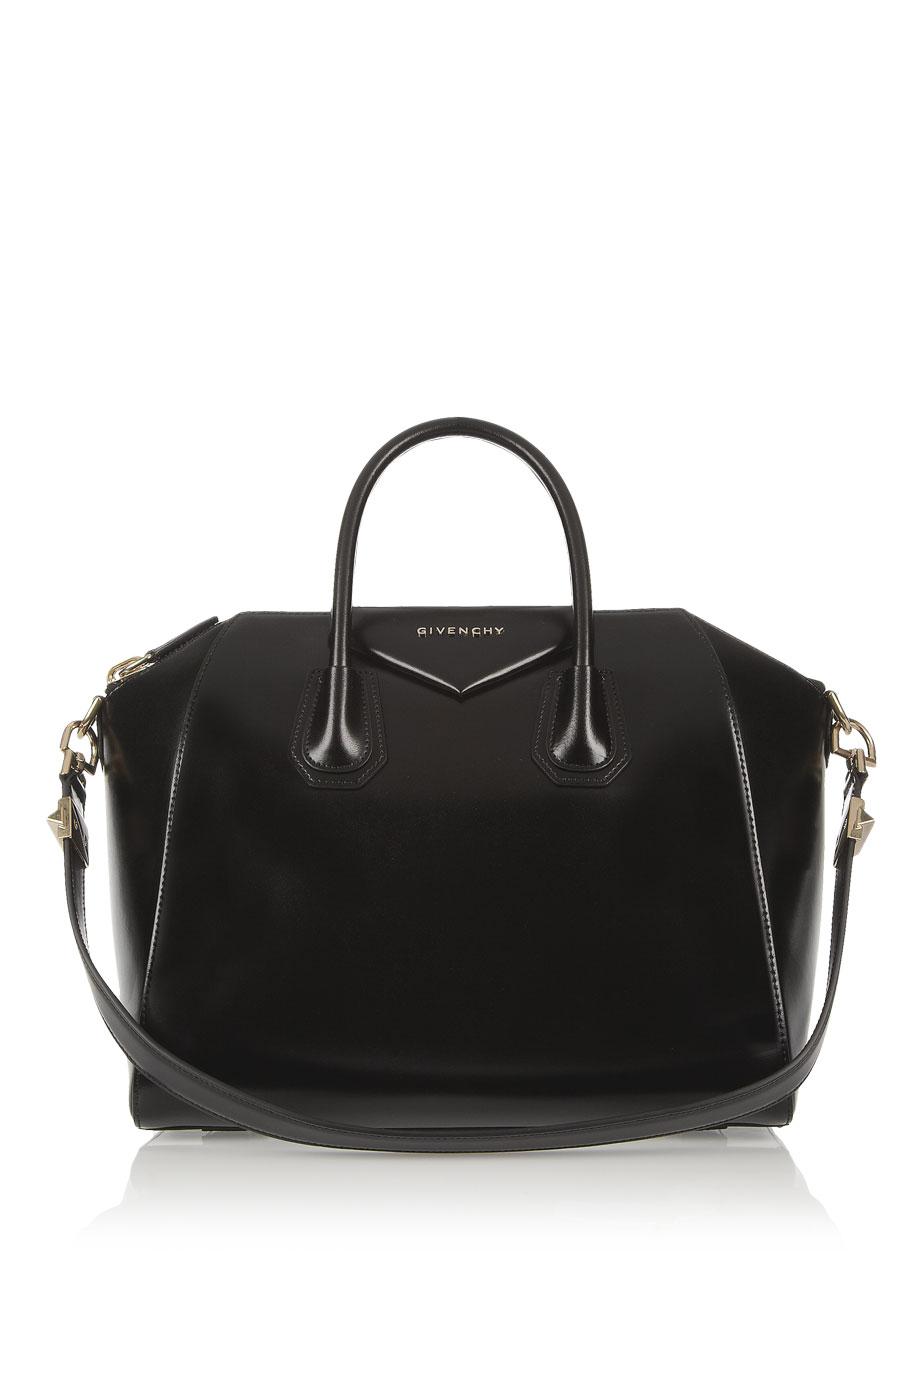 2046e36e5d83 Daisybutter - UK Style and Fashion Blog  givenchy antigona black leather ...